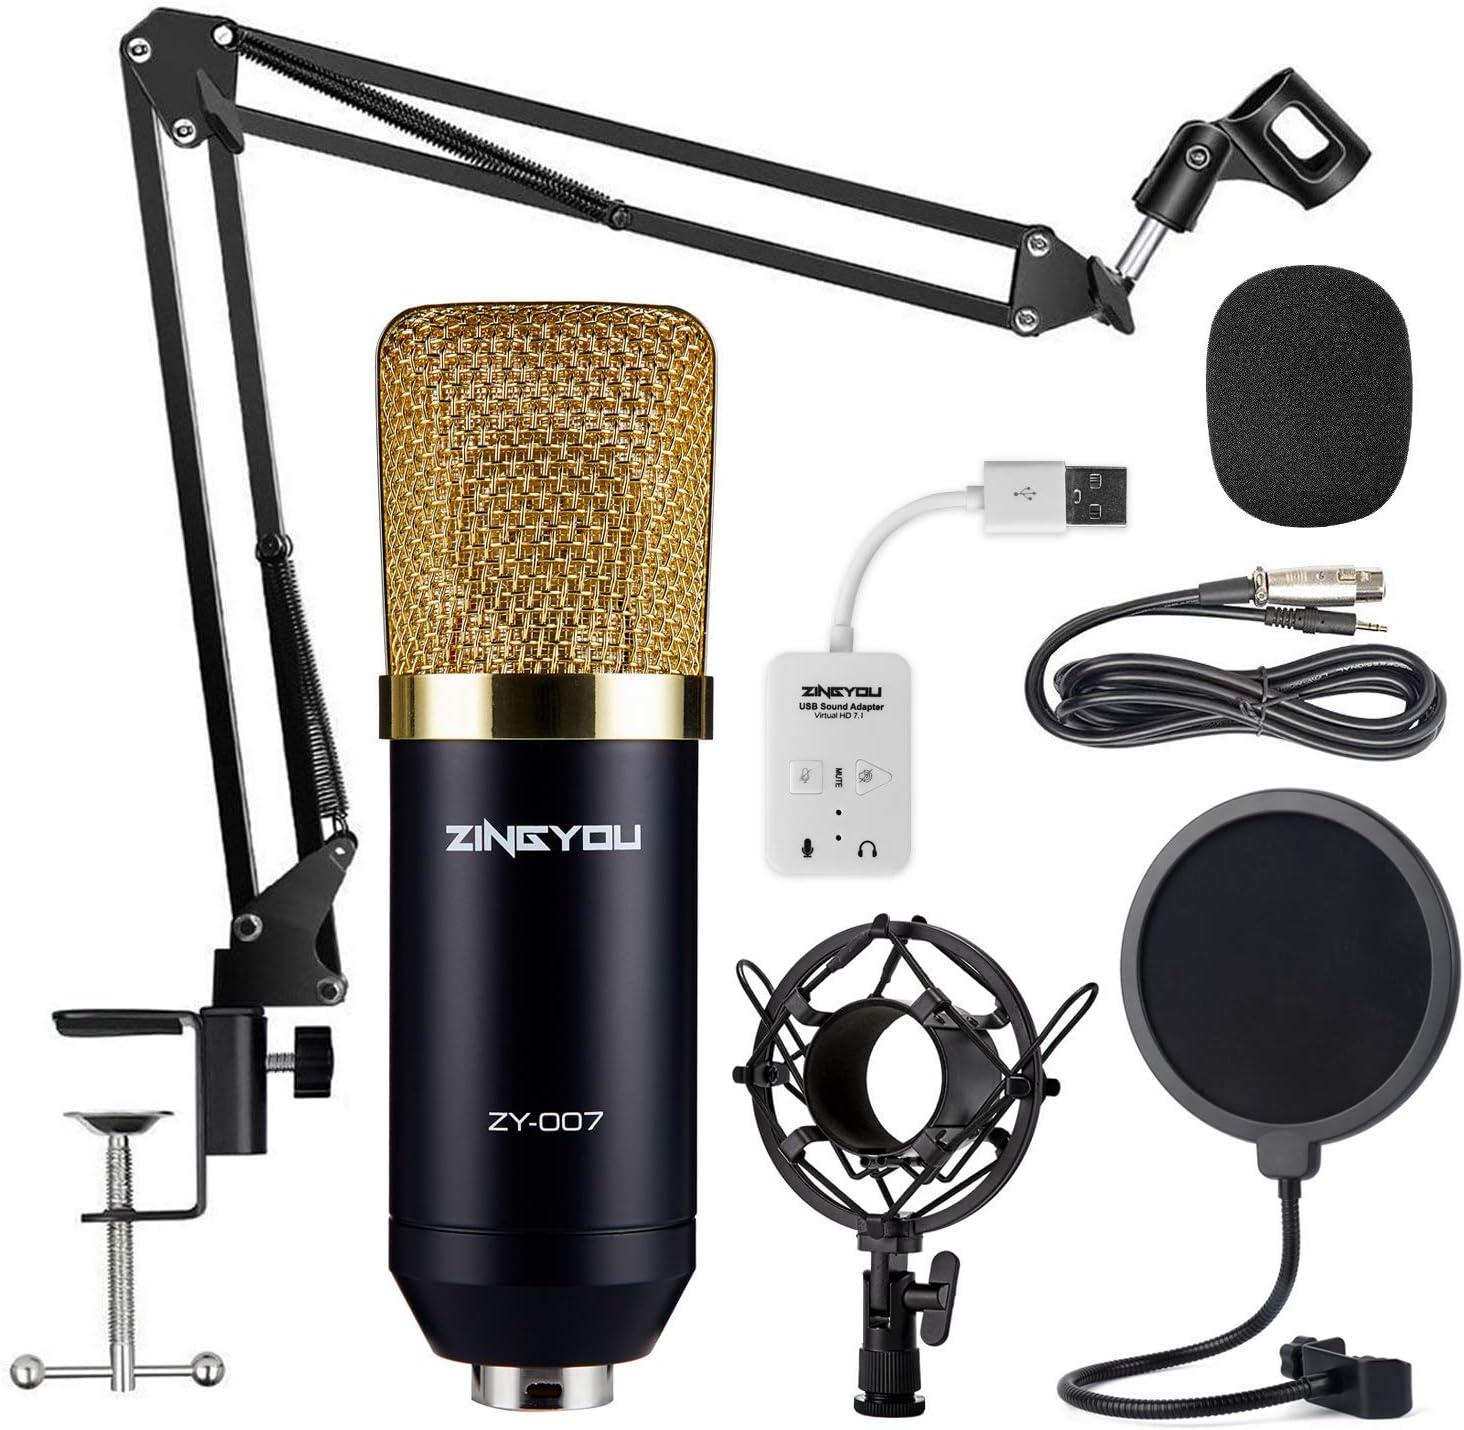 ZINGYOU Condenser Microphone Bundle, ZY-007 Professional Cardioid Studio Condenser Mic Include Adjustable Suspension Scissor Arm Stand, Shock Mount and Pop Filter, Studio Recording & Broadcasting